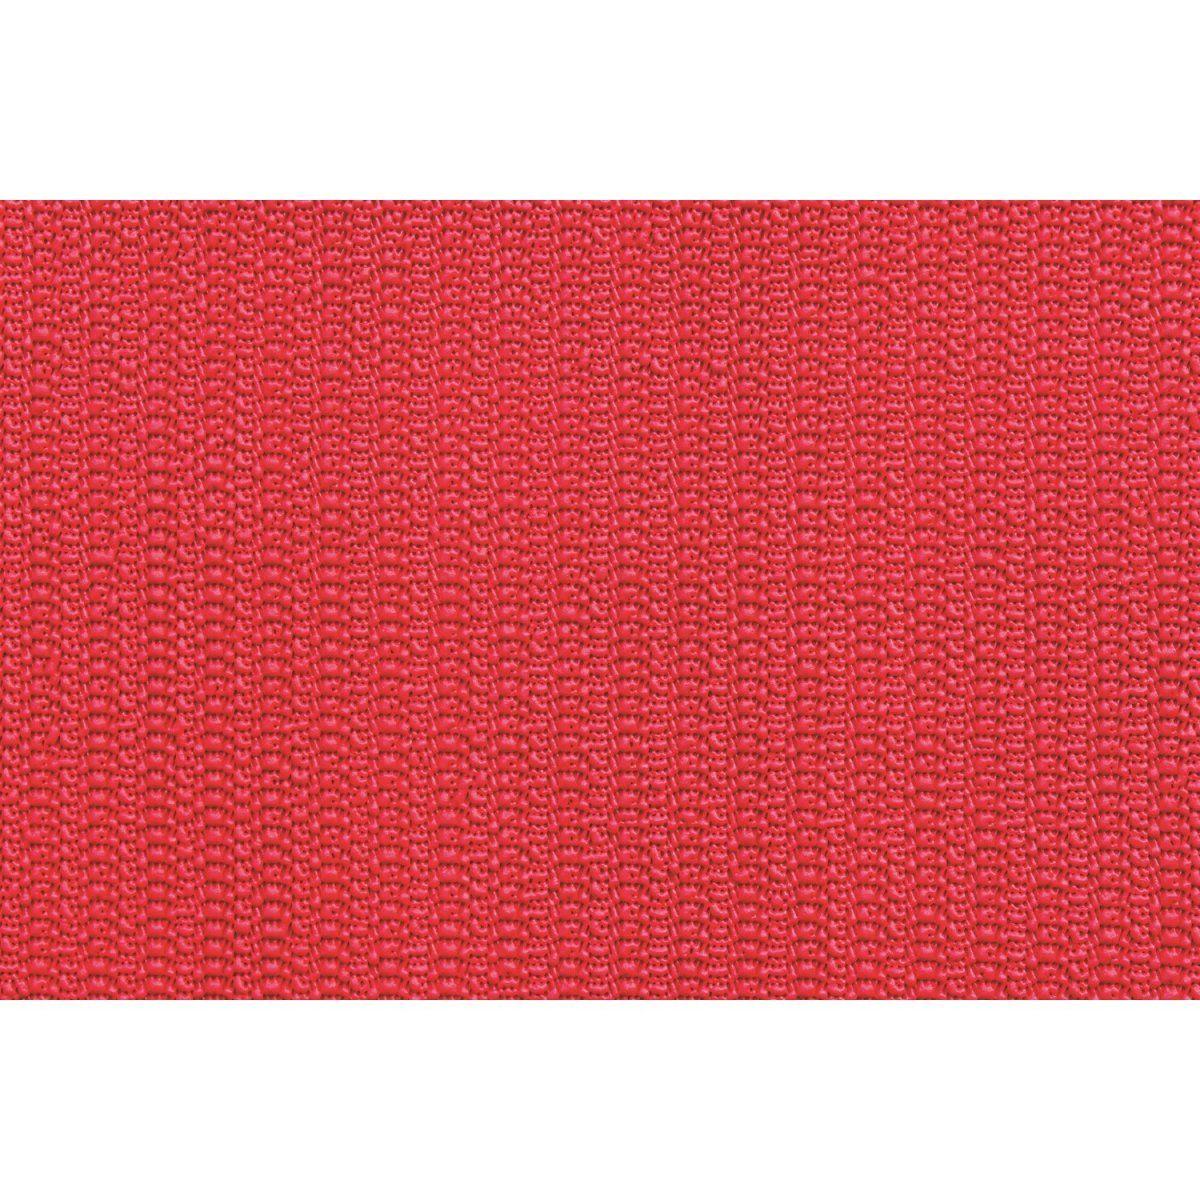 D C Table Gartentischdecke Rot O 130 Cm Rund Jetzt Bestellen Unter Https Moebel Ladendirekt De Garten Gartenmoebel Gartentischdecke Gartentisch Gartenmobel